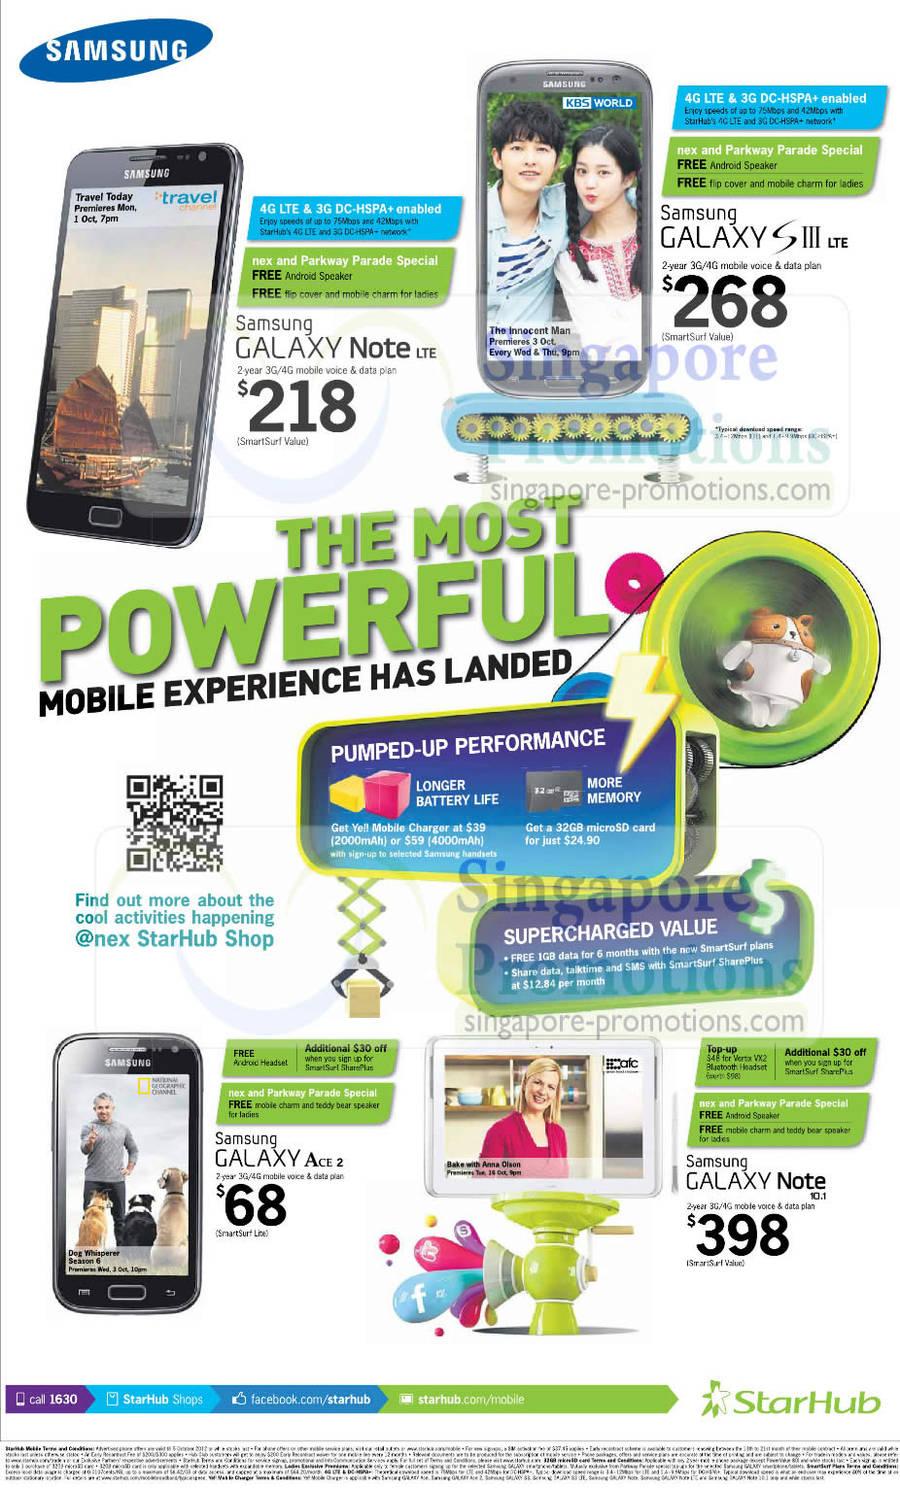 Samsung Galaxy Note LTE, Samsung Galaxy S III LTE, Samsung Galaxy Ace 2, Samsung Galaxy Note 10.1